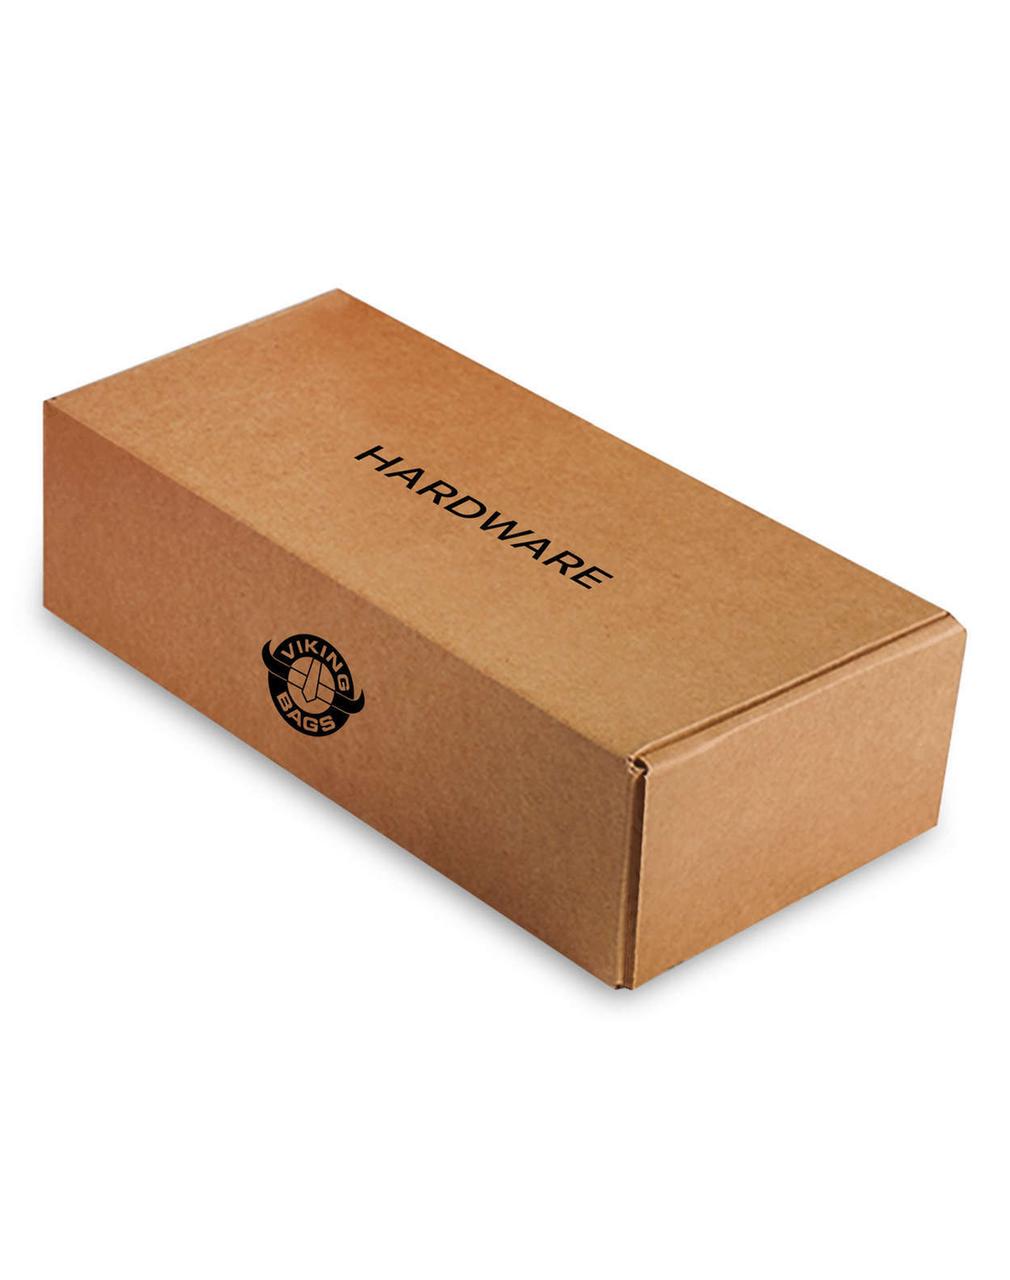 Honda Magna 750 Medium Charger Single Strap Motorcycle Saddlebags Hardware Box